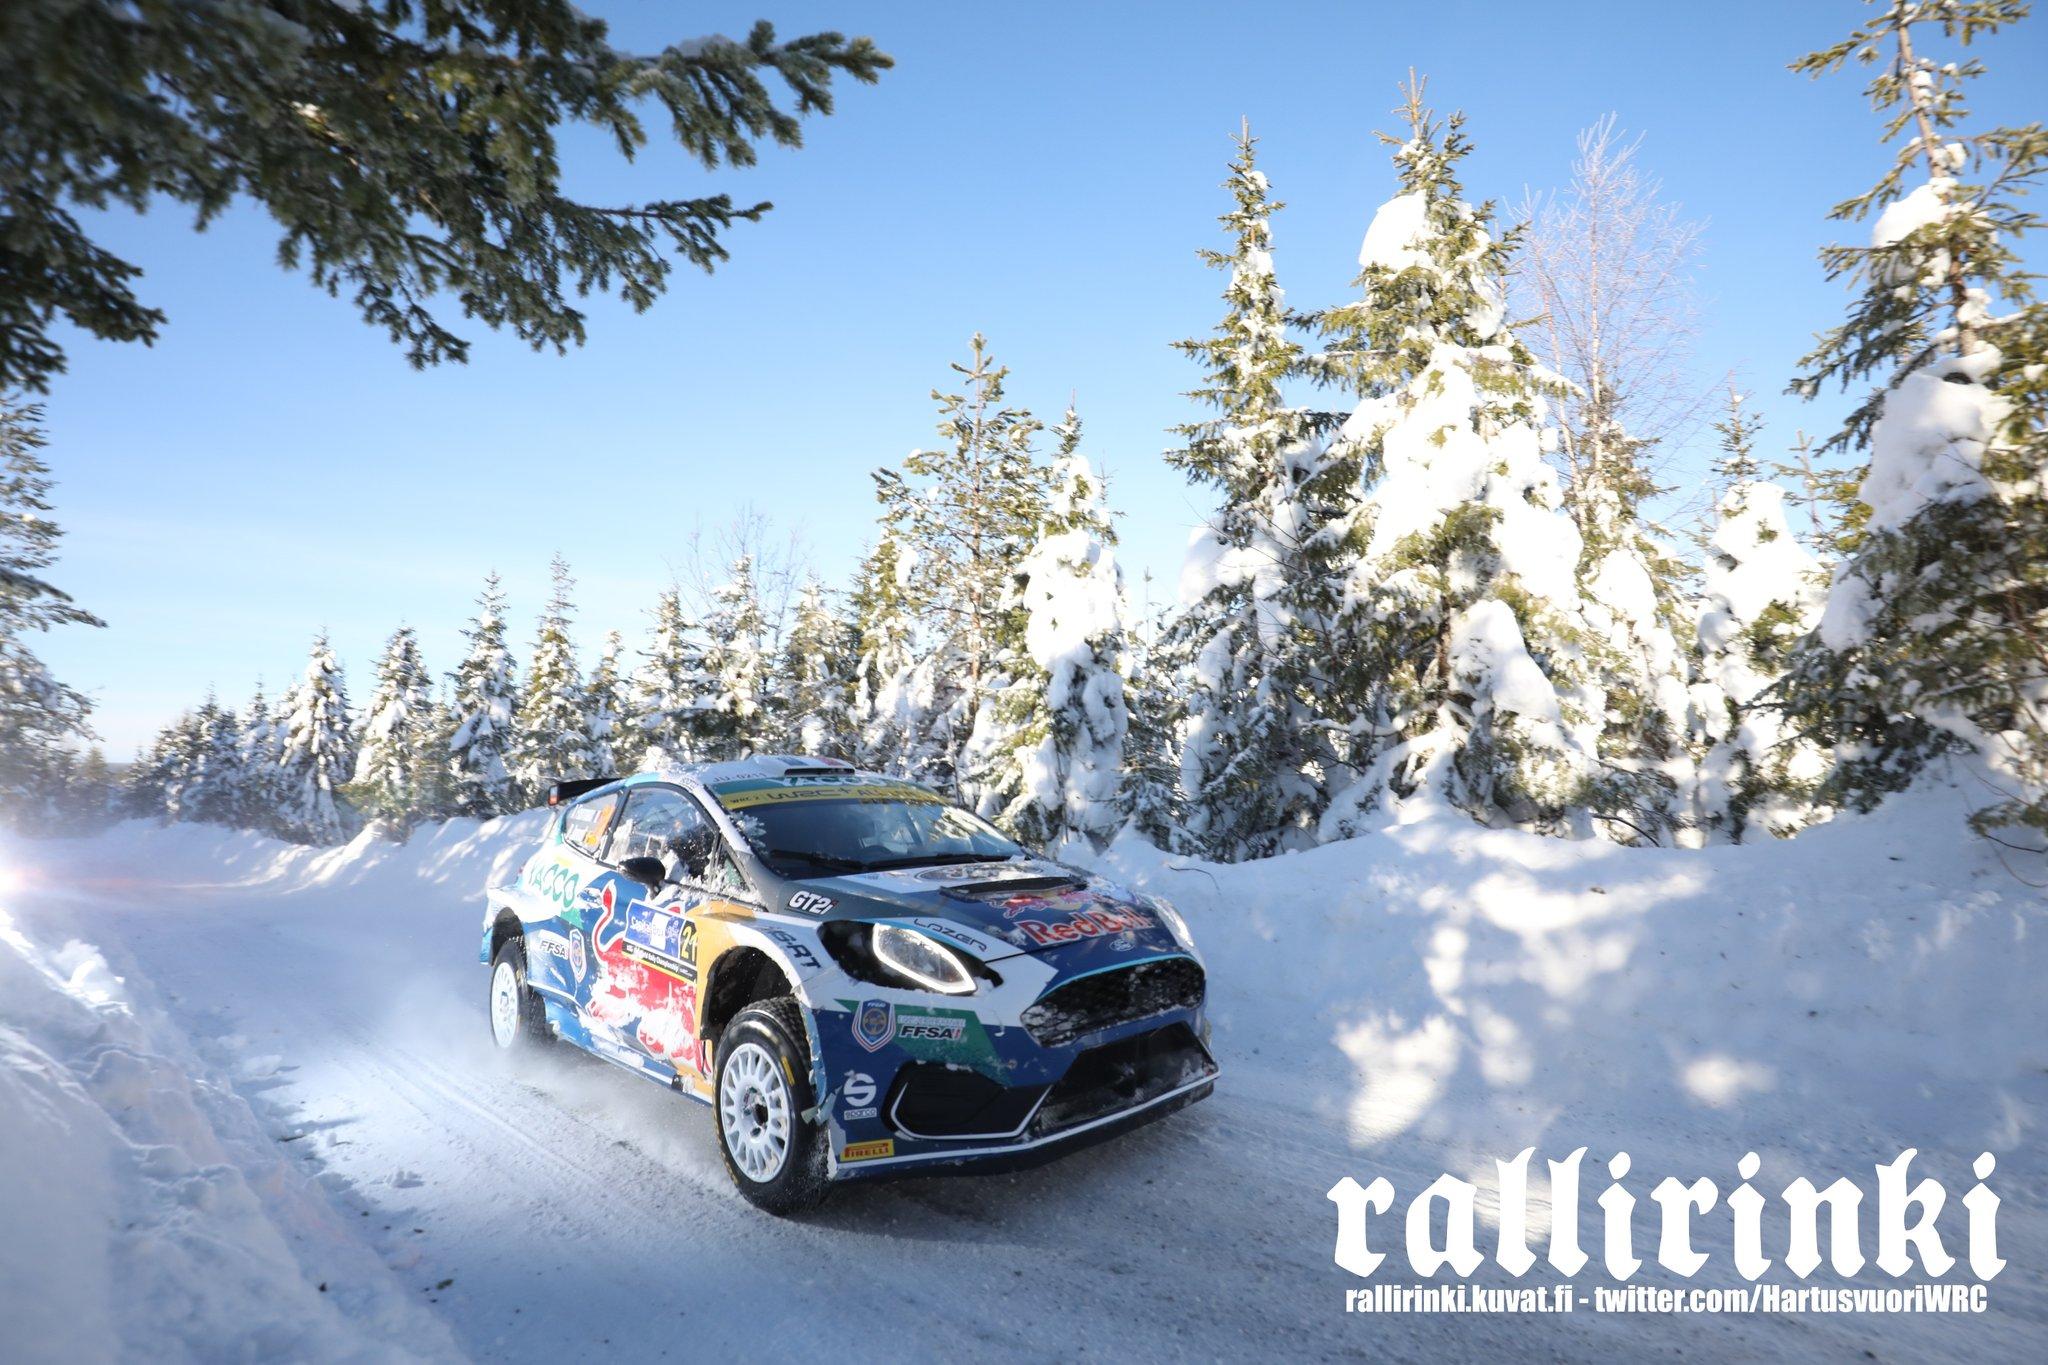 WRC: Arctic Rally Finland - Powered by CapitalBox [26-28 Febrero] - Página 7 EvTcbFHXIAEbEDV?format=jpg&name=large